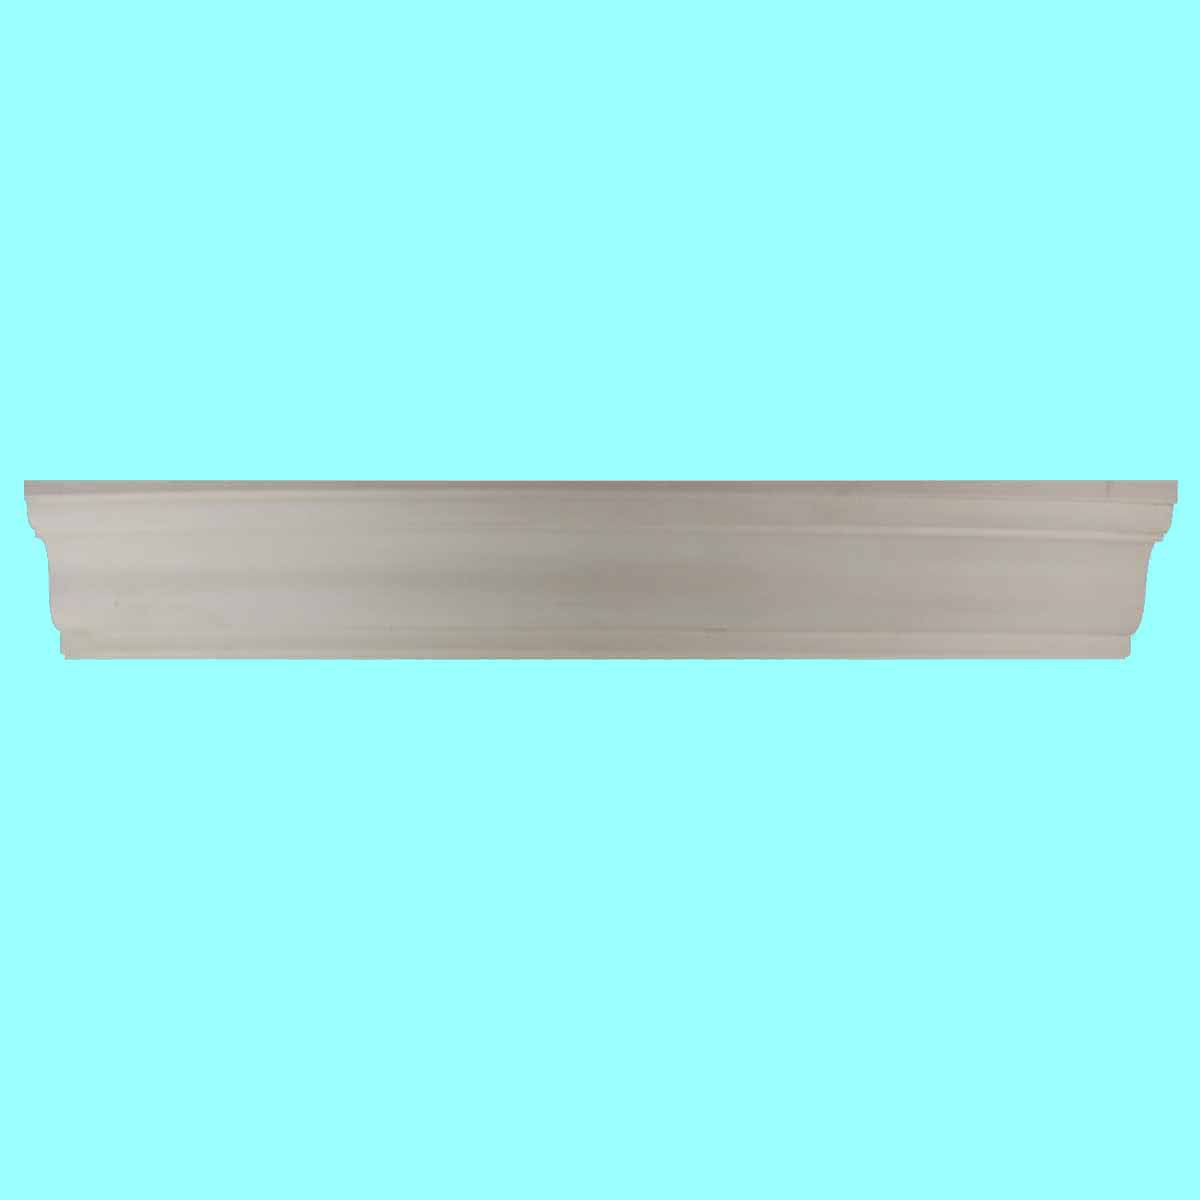 Cornice White Urethane Sample of 11501 24 Long Cornice Cornice Moulding Cornice Molding